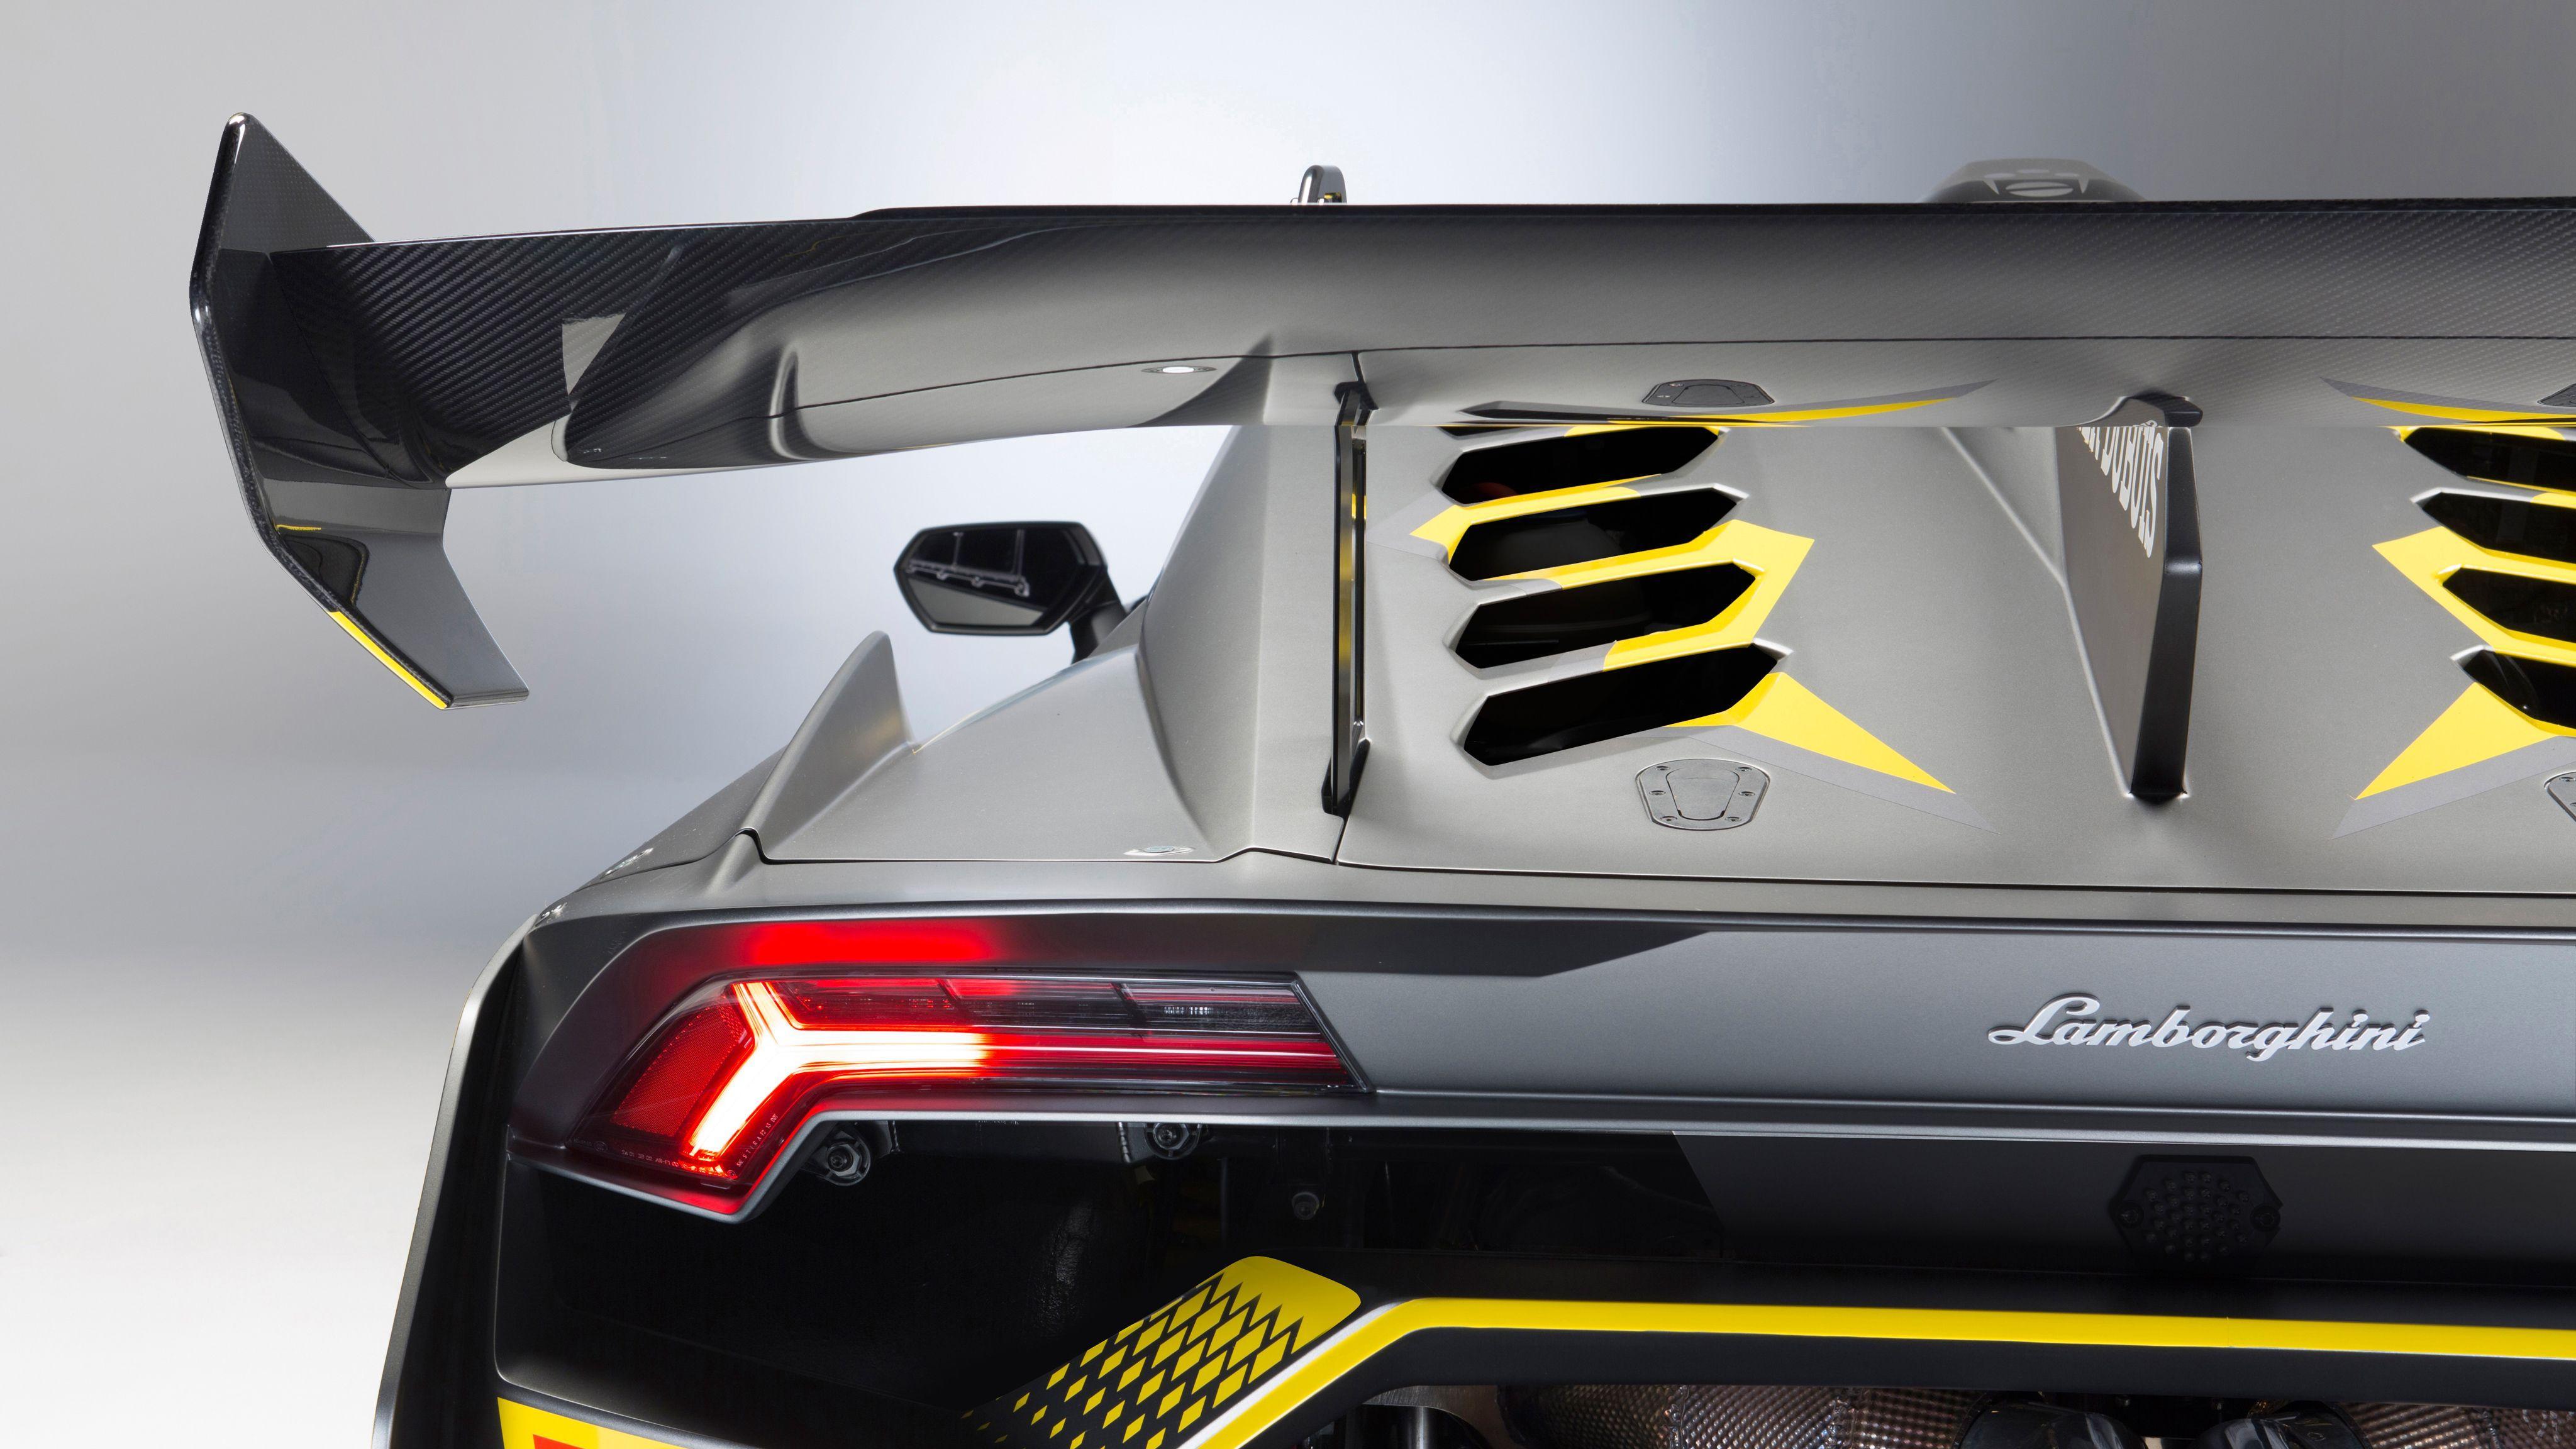 Lamborghini Huracan 4k Wallpapers Top Free Lamborghini Huracan 4k